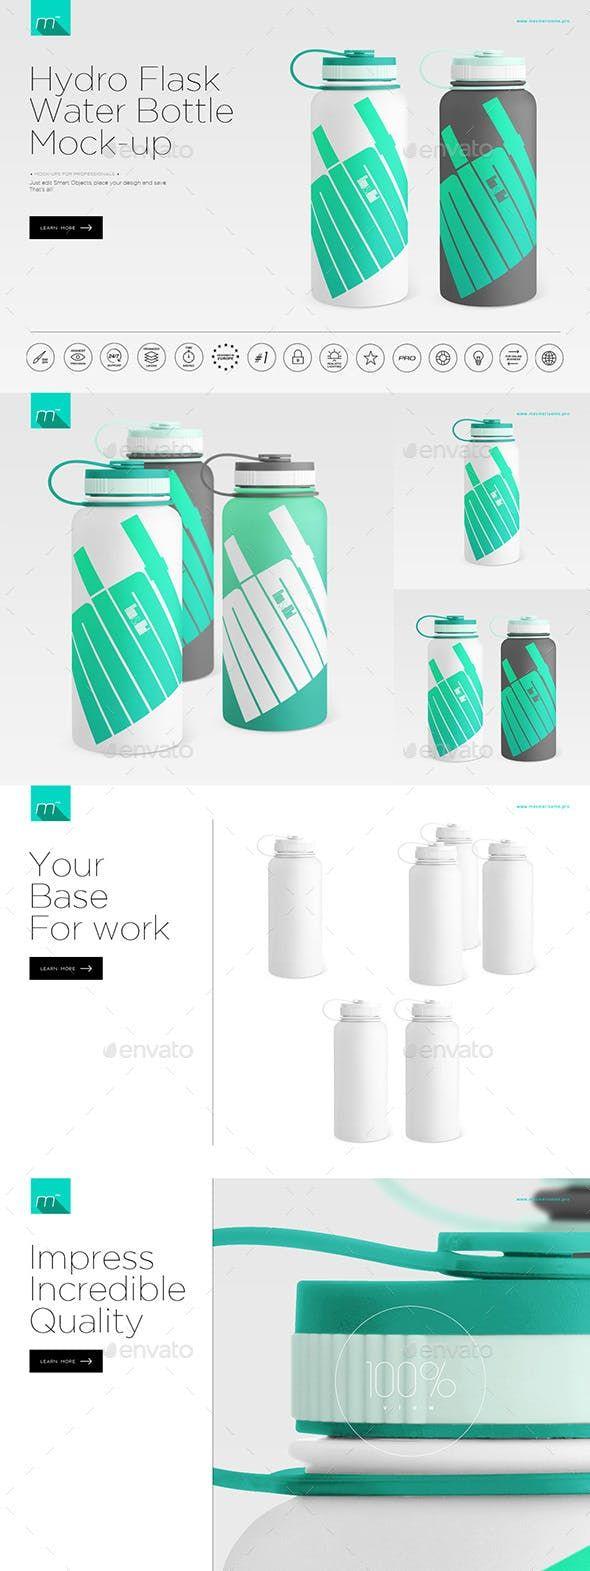 Hydro flask mockup free